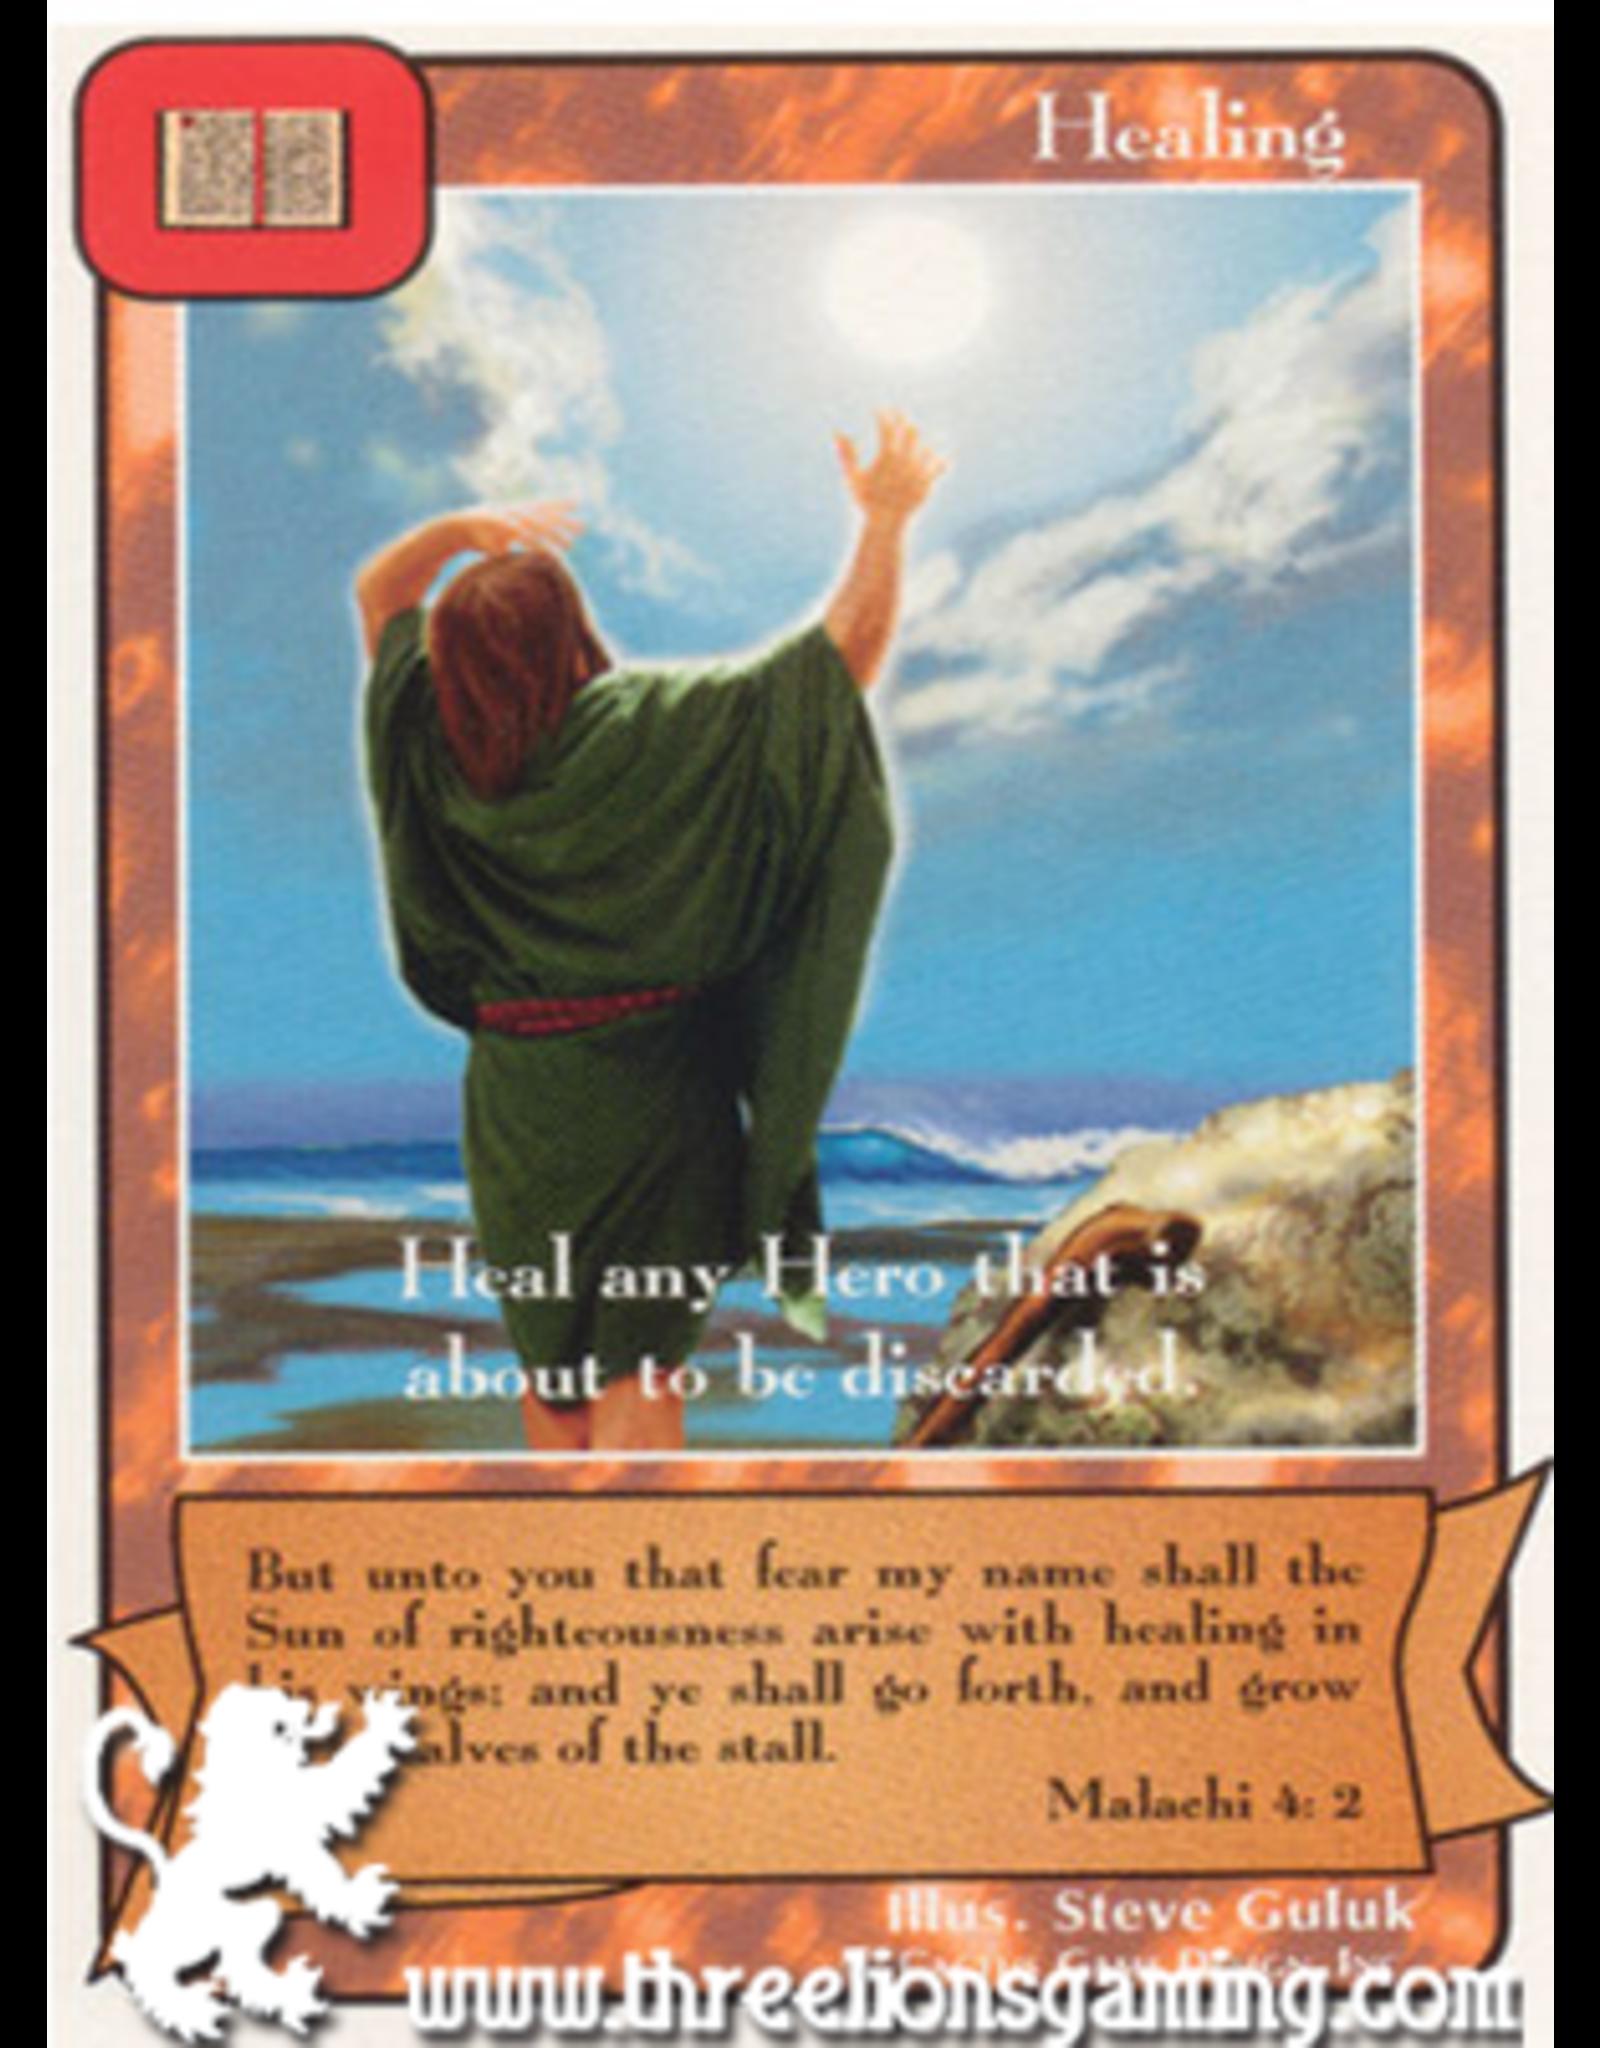 Orig: Healing